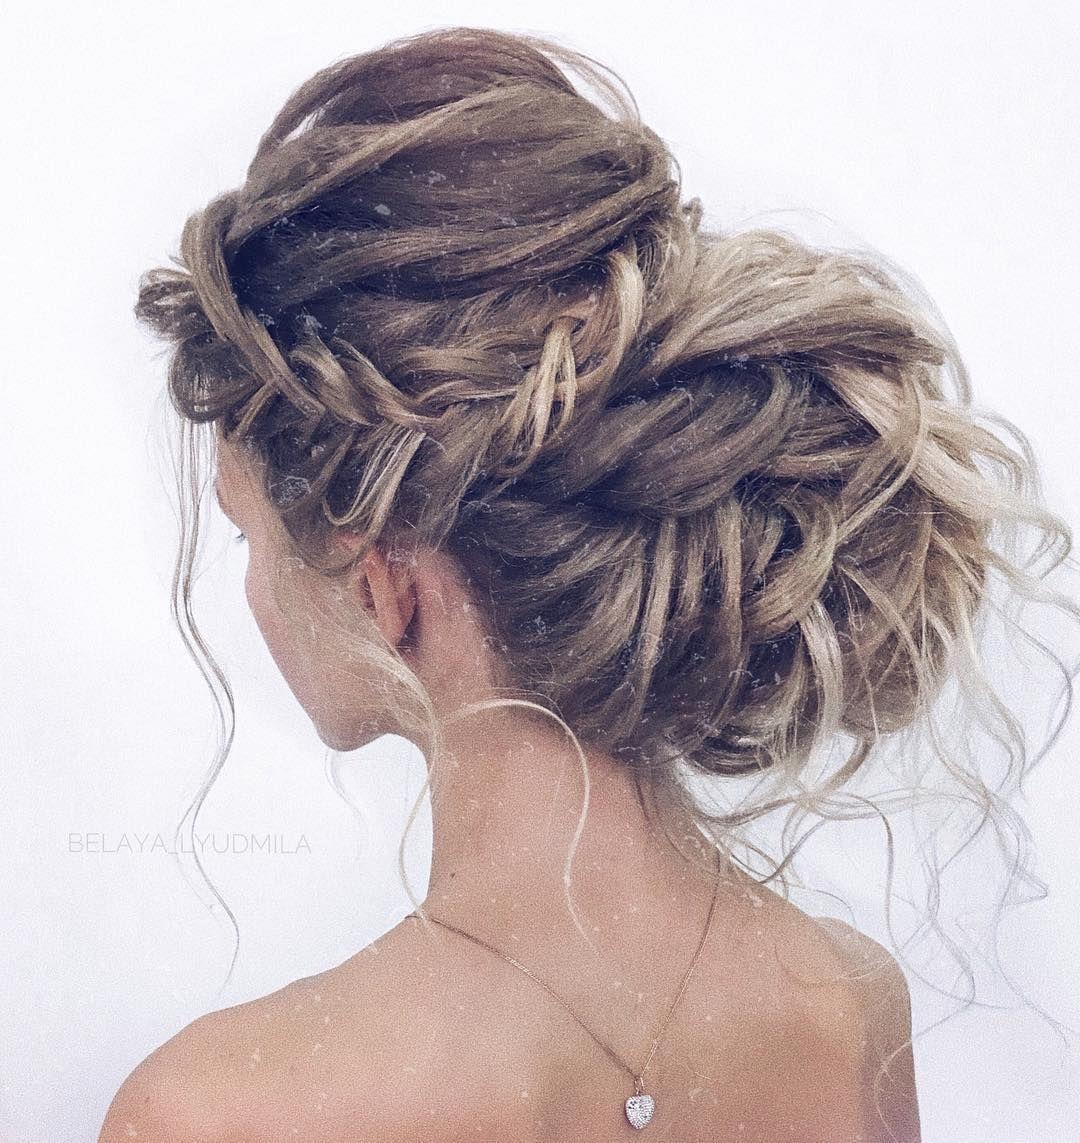 35 gorgeous updo wedding hairstyle inspiration , braids ,braided updo hairstyles ,braided ponytails ,wedding updo, textured braids #hairstyle #hair #braids #updo